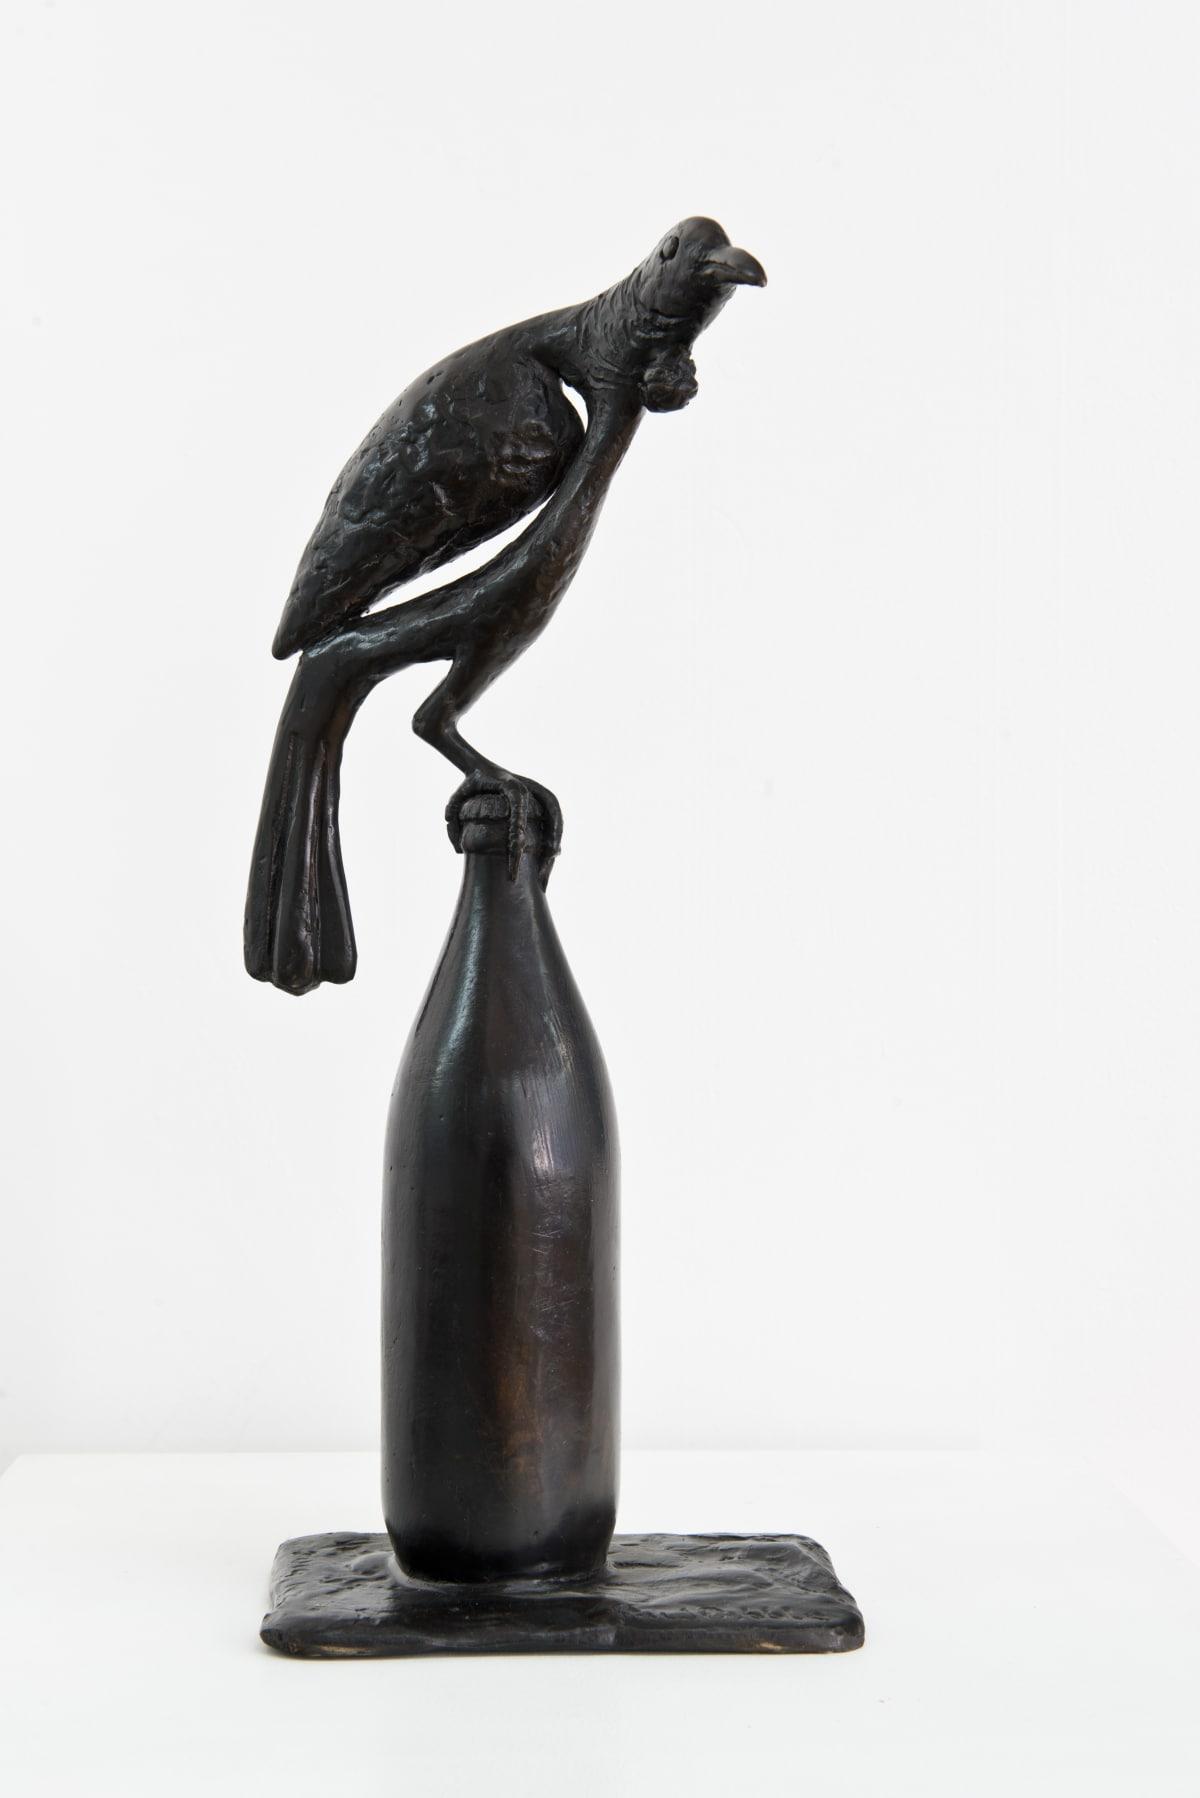 Paul DIBBLE Tui, 2014 Cast Patinated Bronze 18.1 x 7.9 x 5.1 in 46 x 20 x 13 cm #1/5